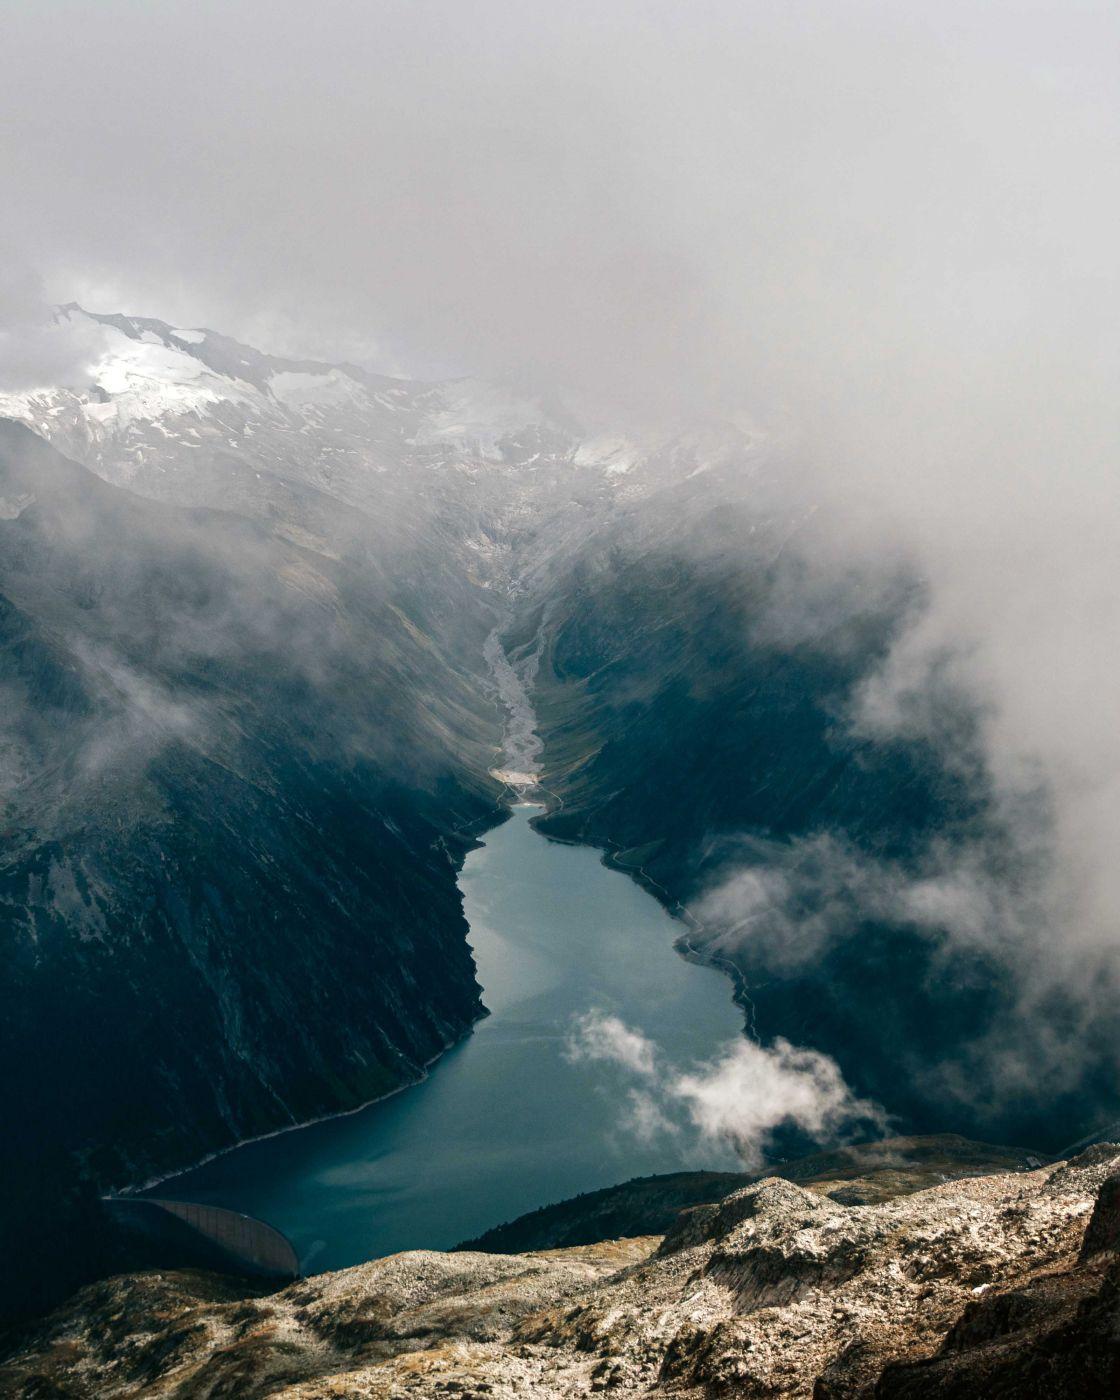 Hintertuxer Gletscher, Austria